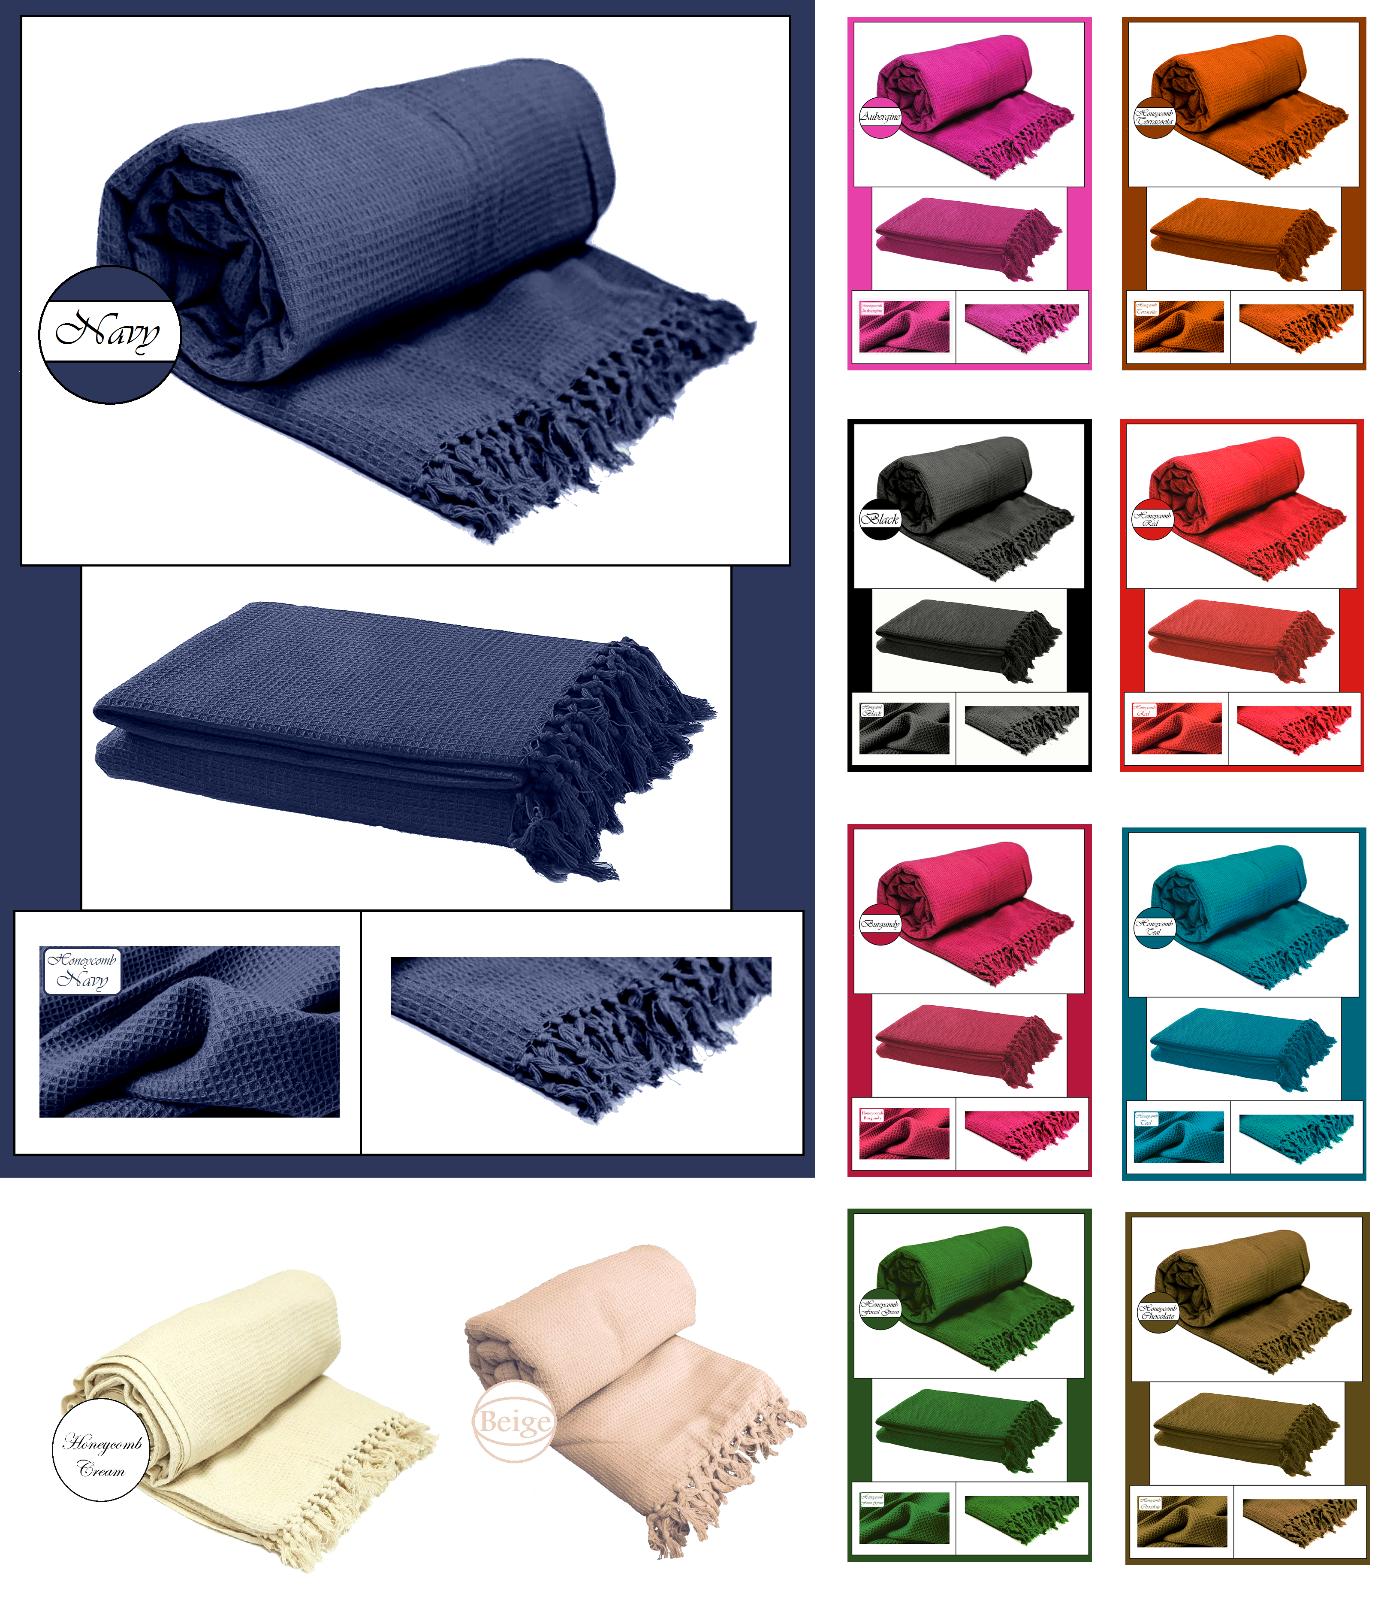 100% Cotton Honeycomb  Sofa - Bed - Throw - Blanket - Bedspr